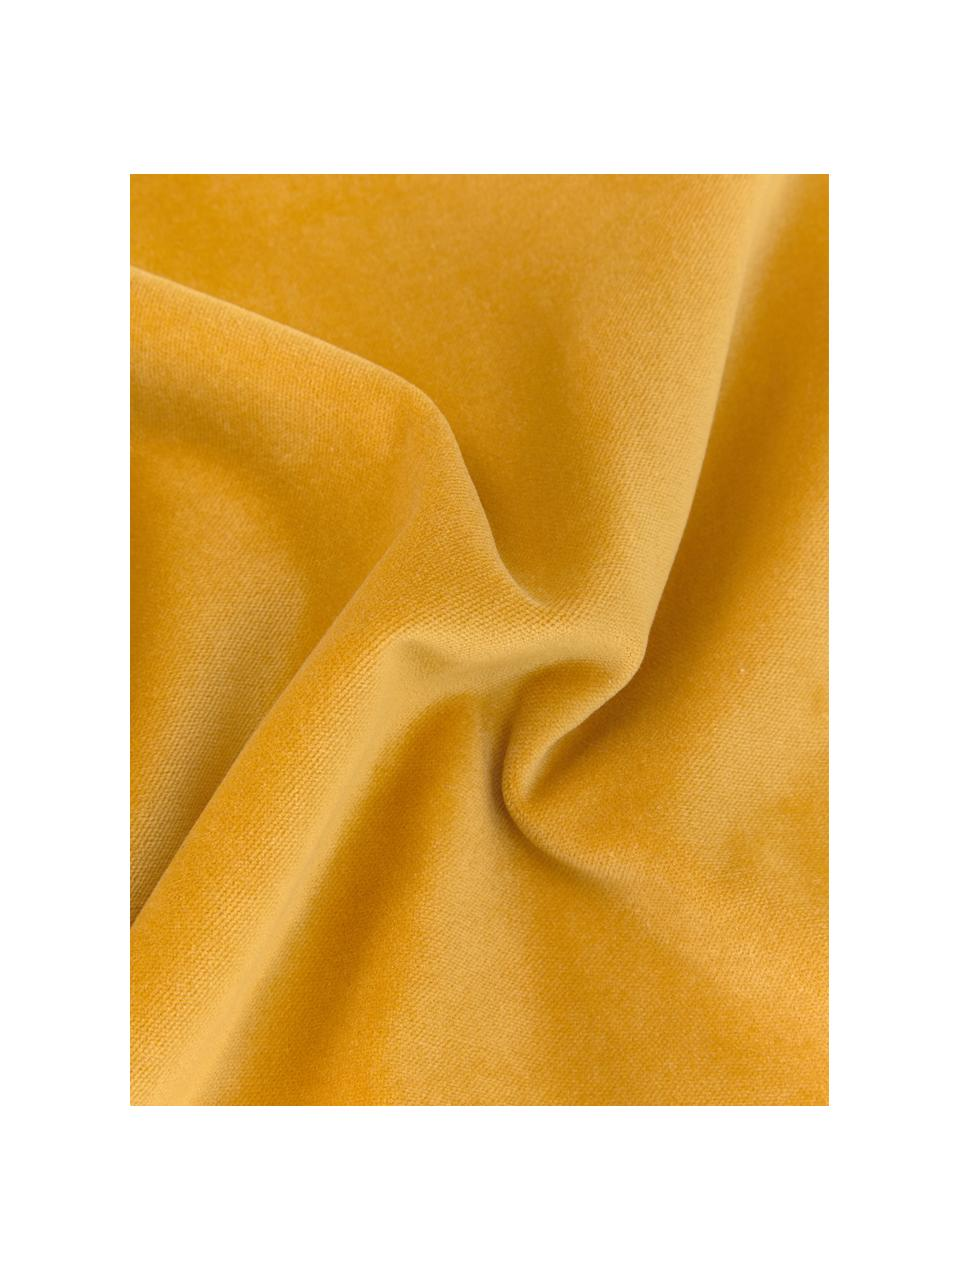 Einfarbige Samt-Kissenhülle Dana in Ockergelb, 100% Baumwollsamt, Ocker, 50 x 50 cm